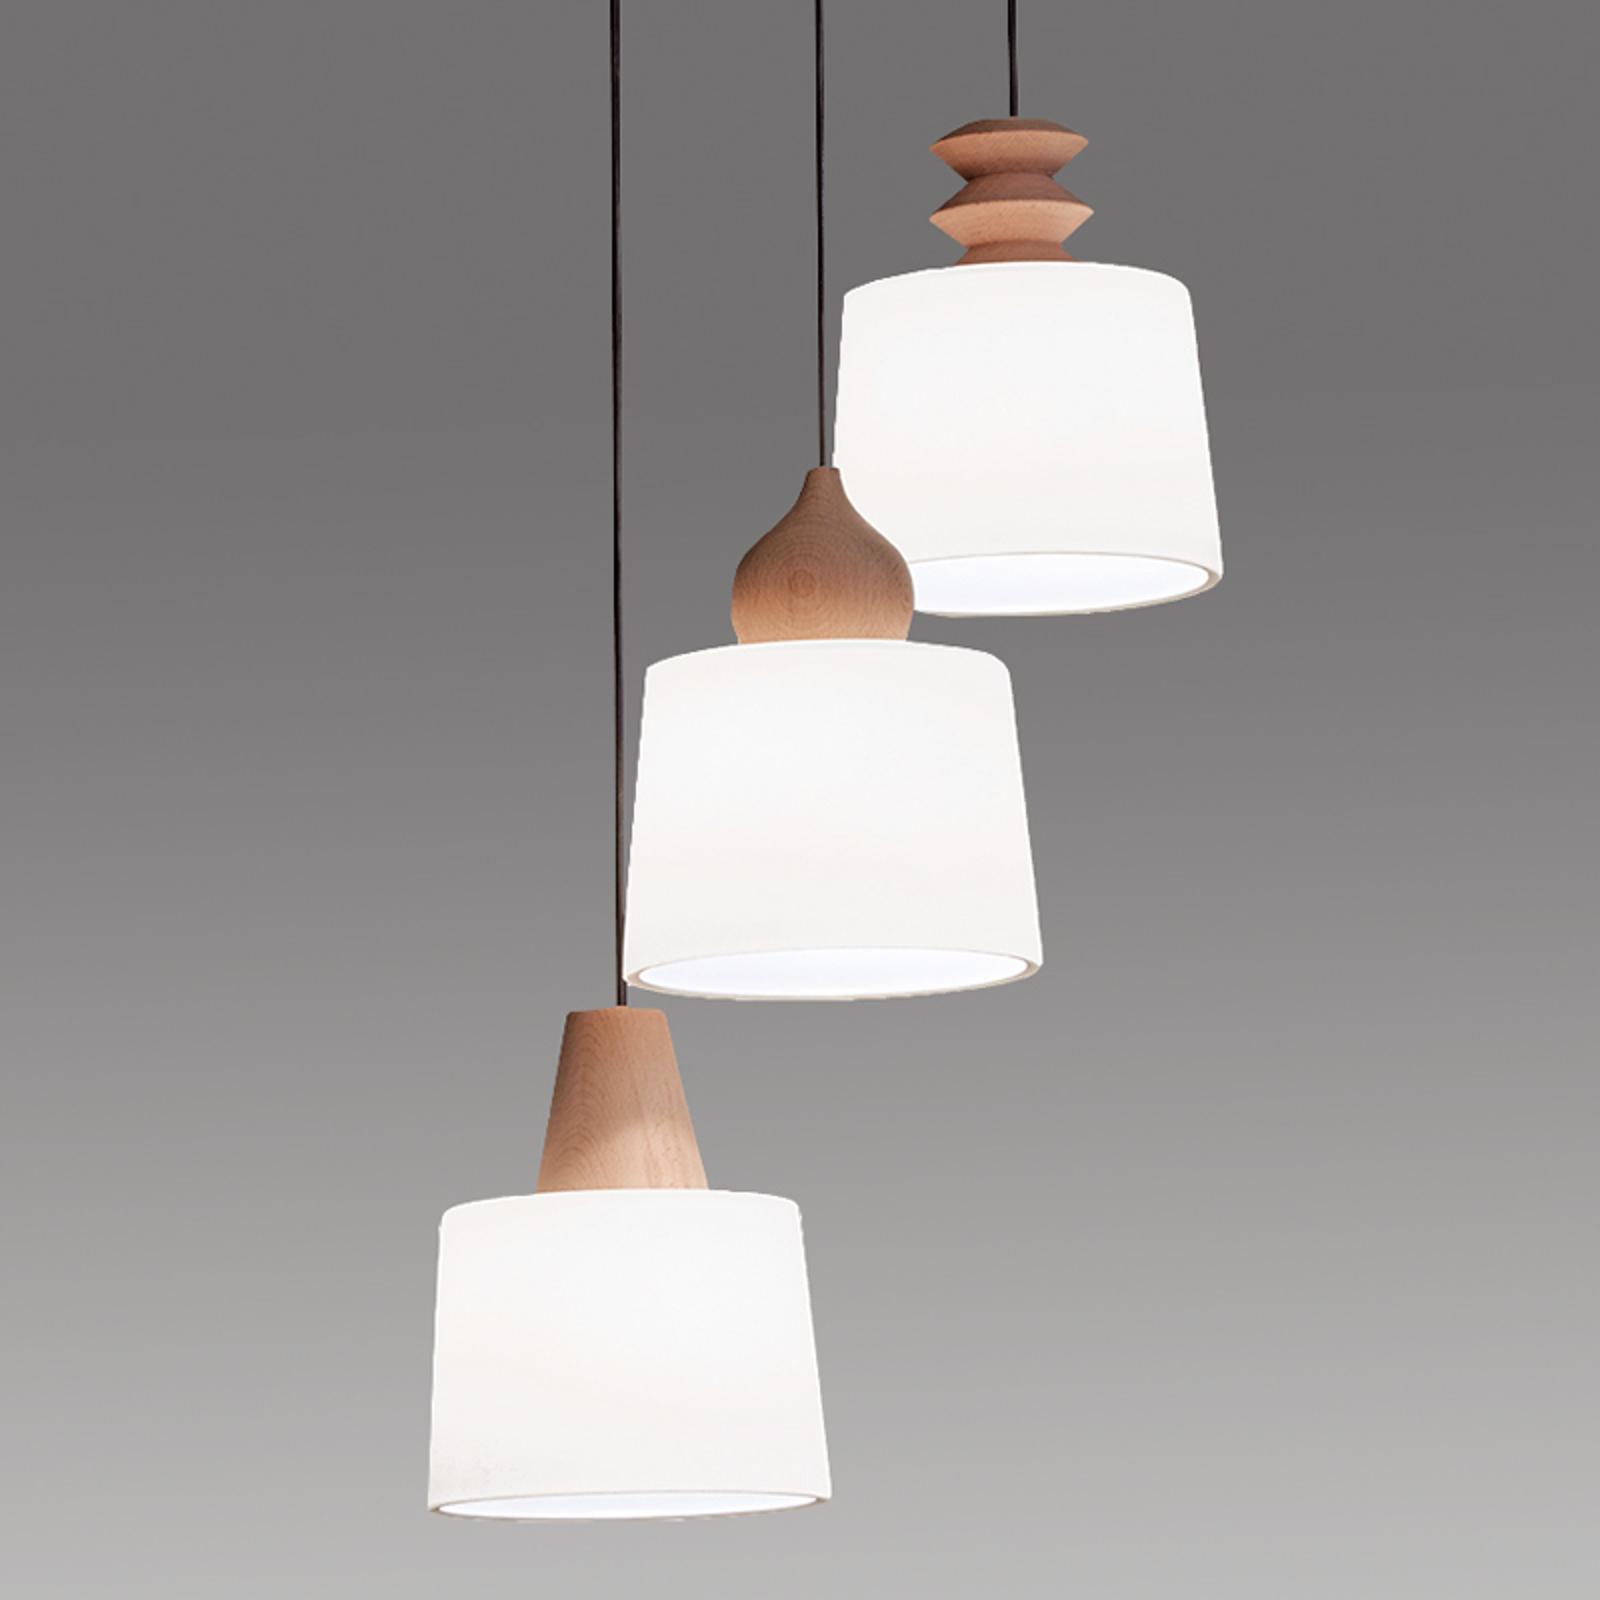 Eduardo hængelampe, 3 lyskilder